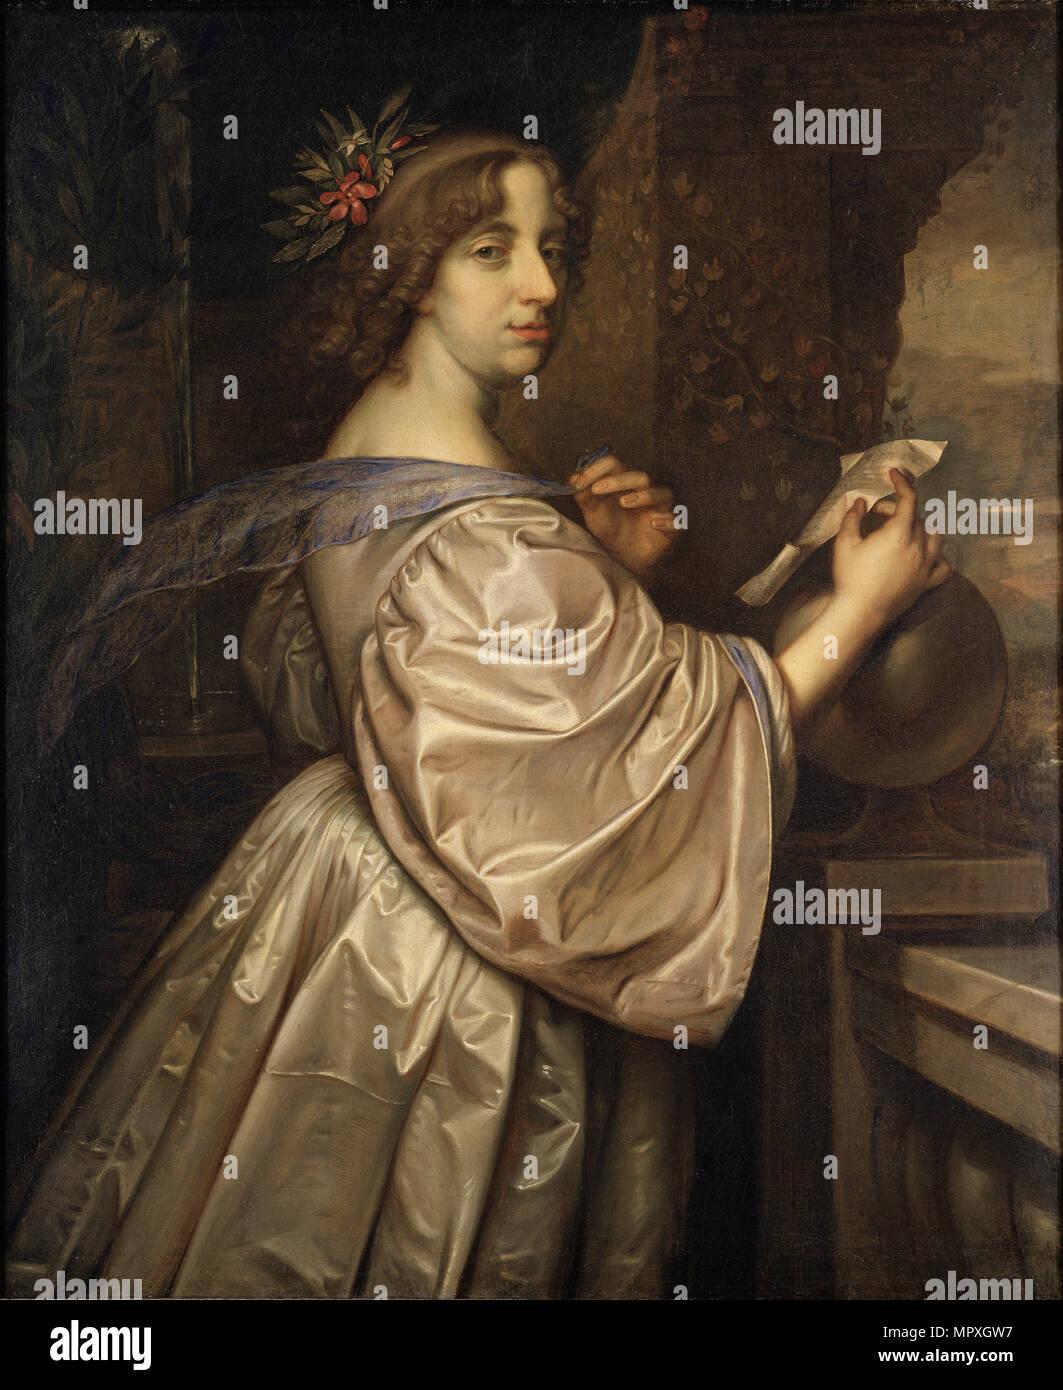 Portrait of Queen Christina of Sweden (1626-1689), 1650. - Stock Image